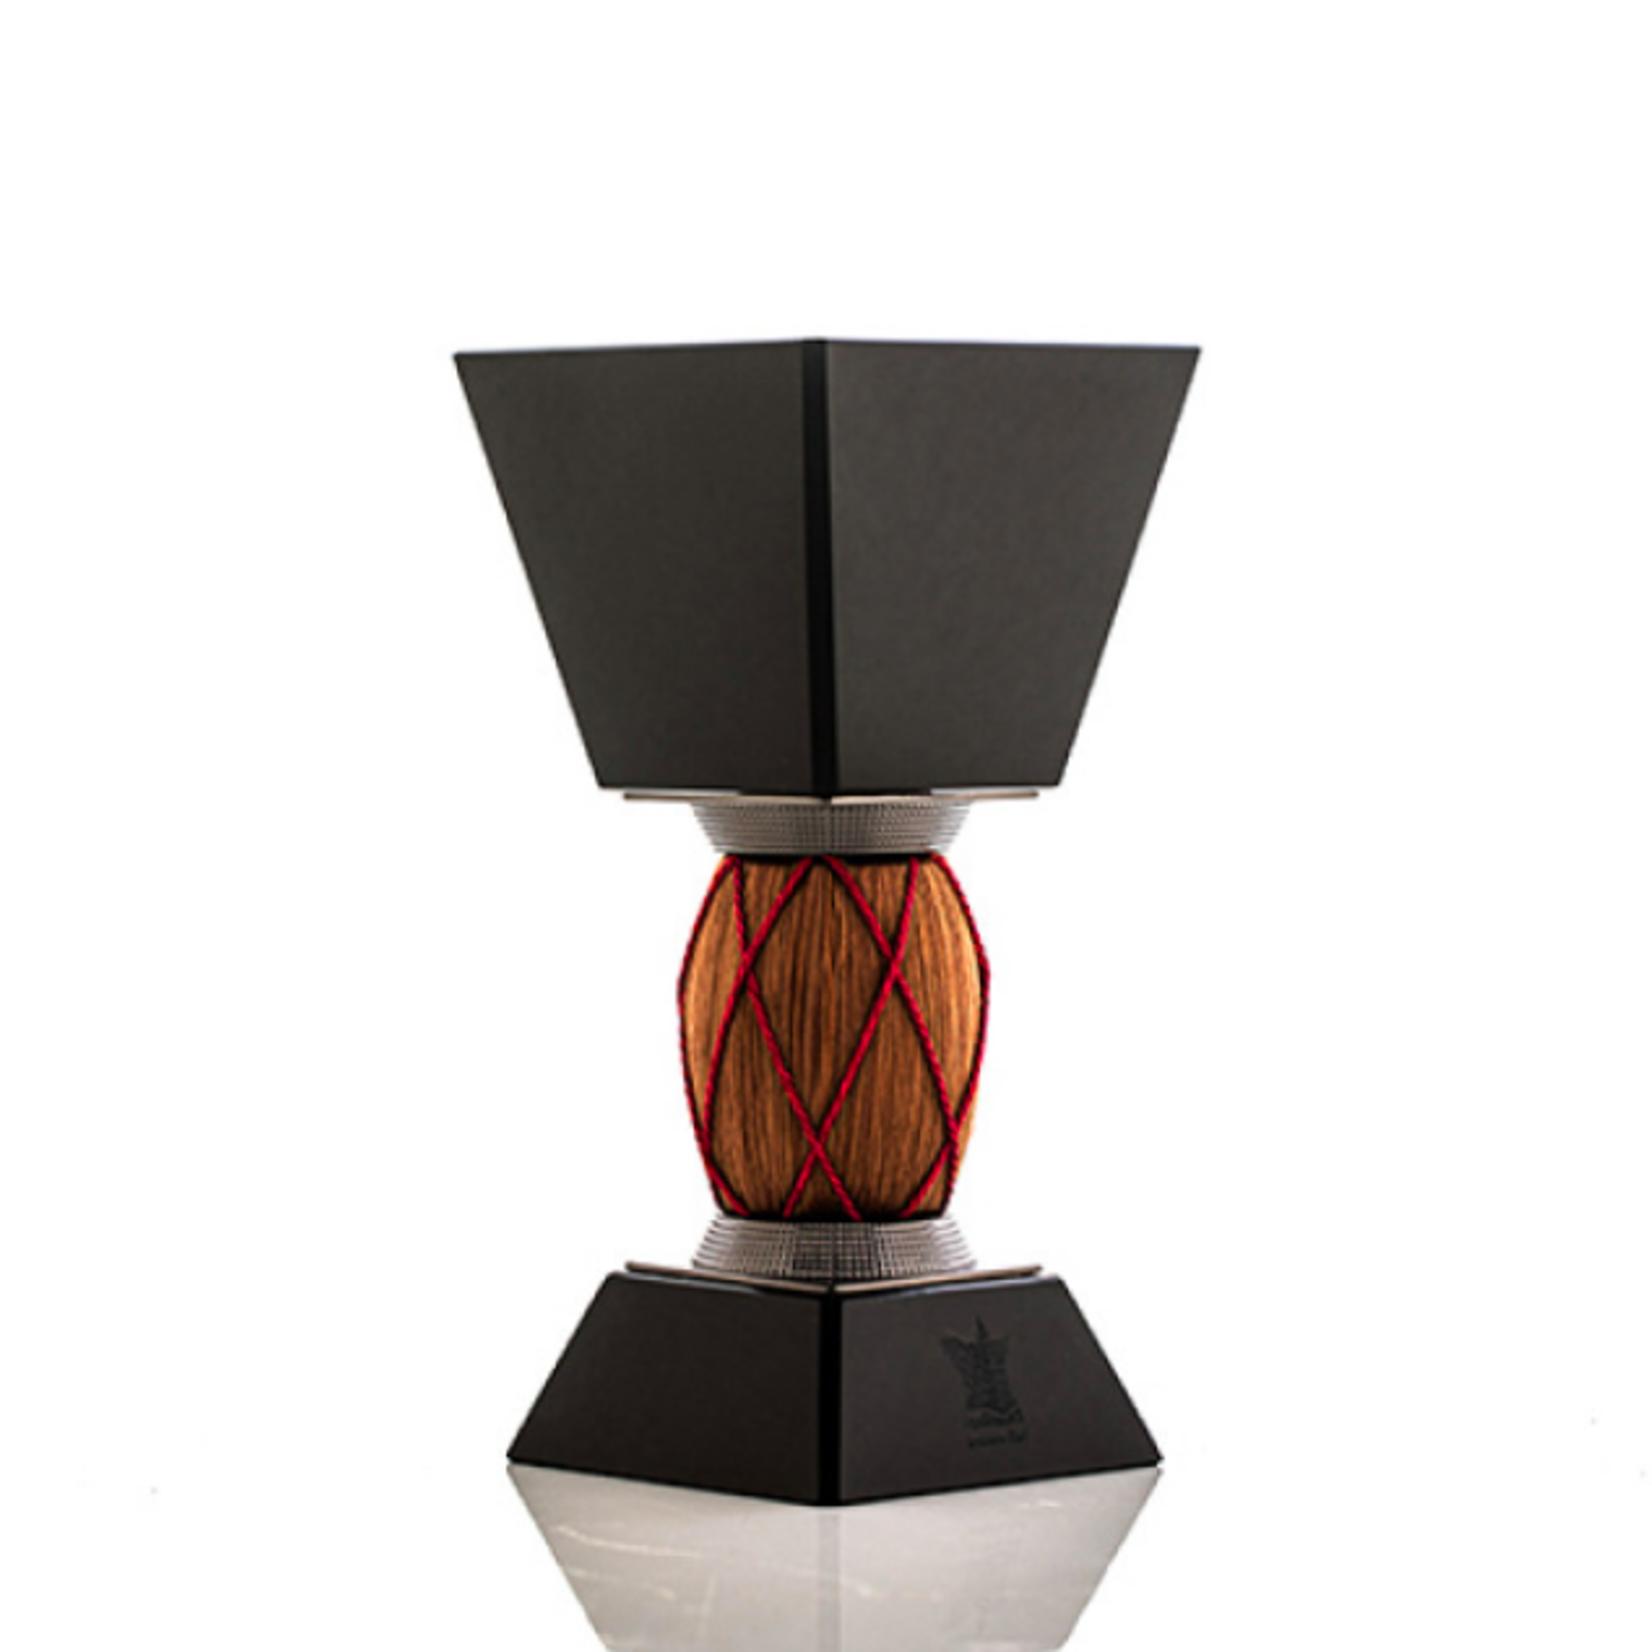 Zaree incense burner - Silver